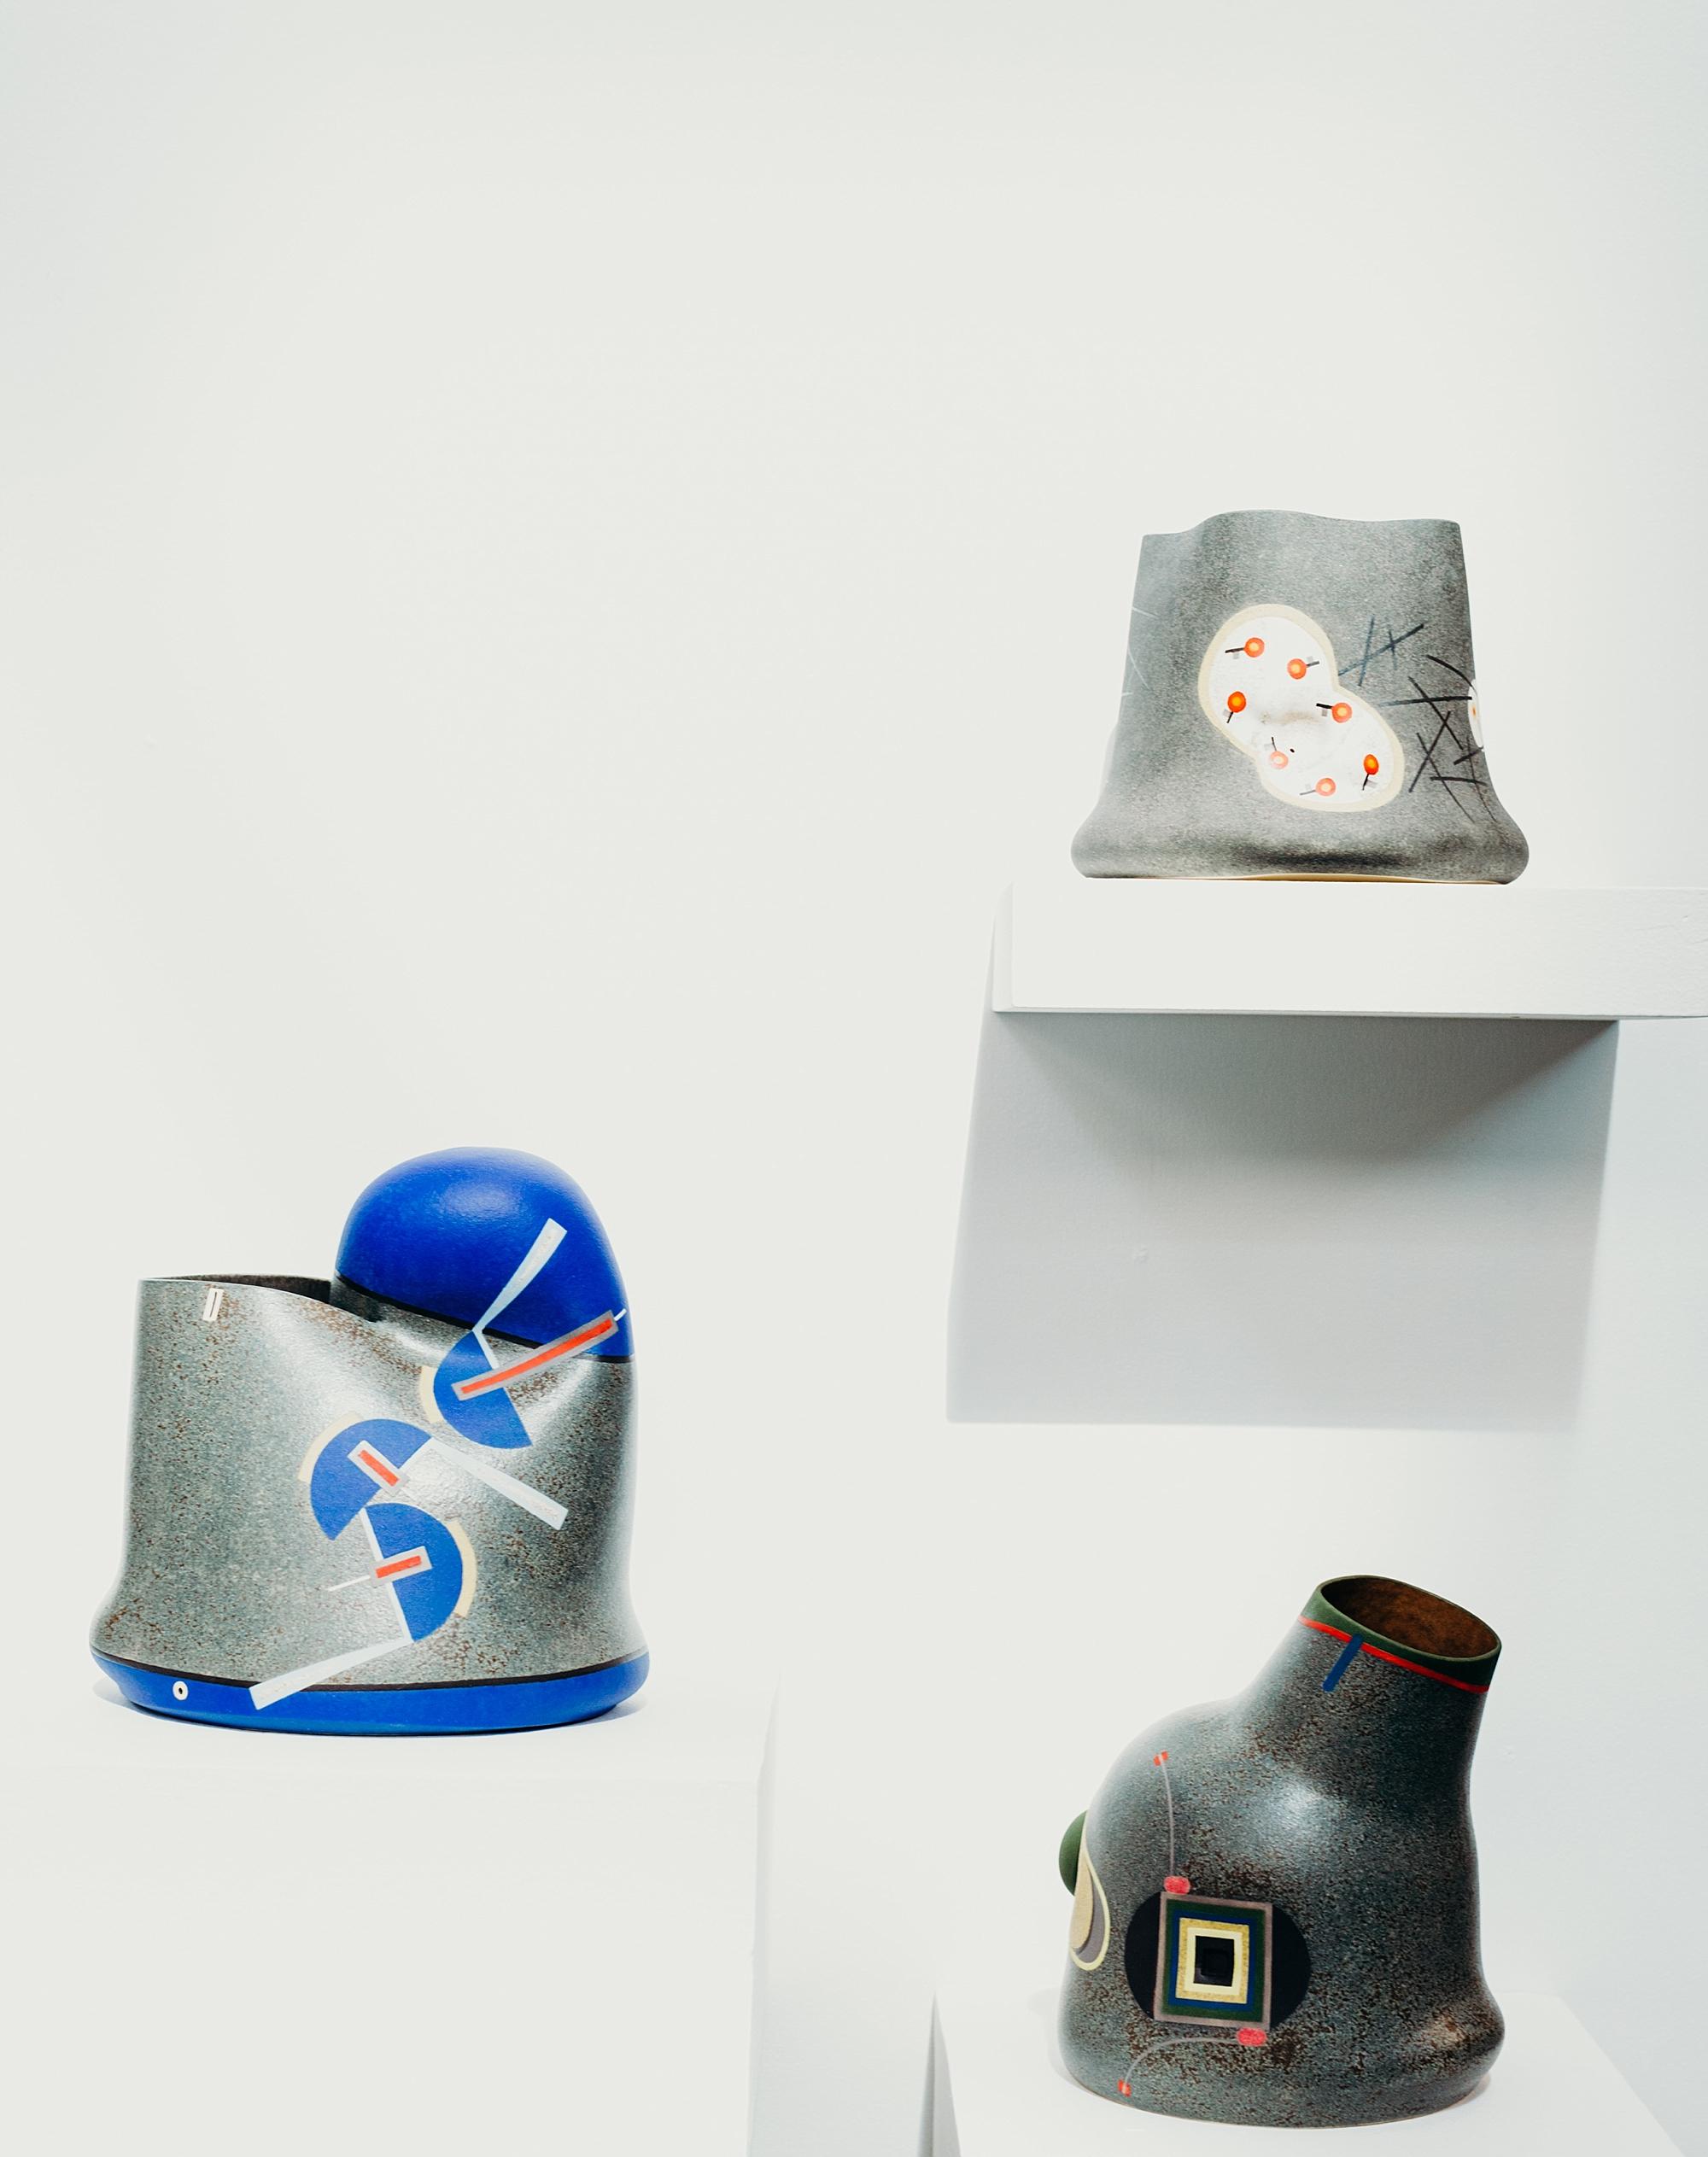 Joe_Mac_Creative_Photography_pittsburgh_NCECA_National_Council_On_Education_For_The_Ceramic_Arts17.JPG